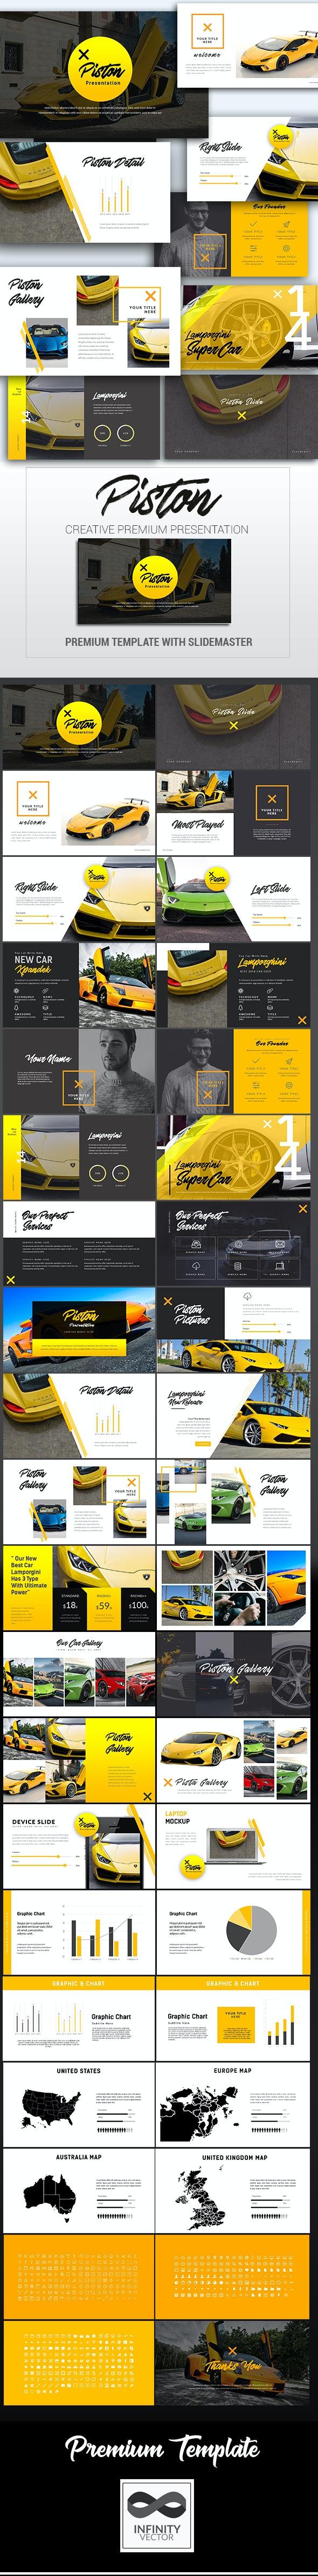 Piston Car Presentation Powerpoint - PowerPoint Templates Presentation Templates